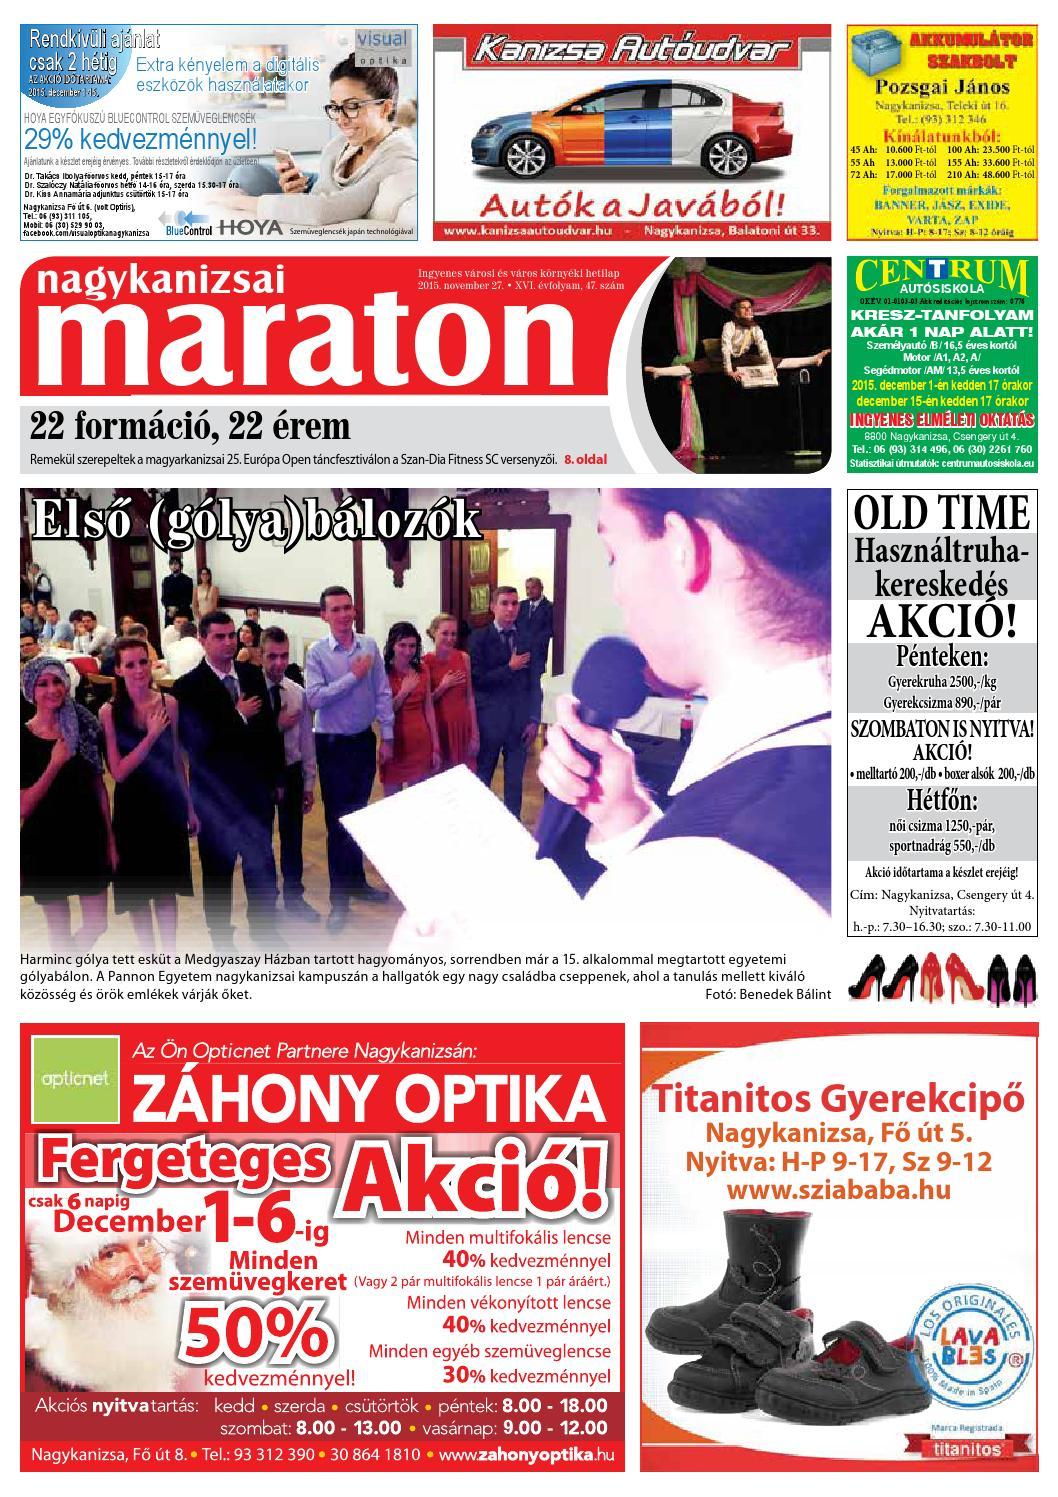 Nagykanizsai Maraton - 2015. 11. 27. by Maraton Lapcsoport Kft. - issuu 86479e9645